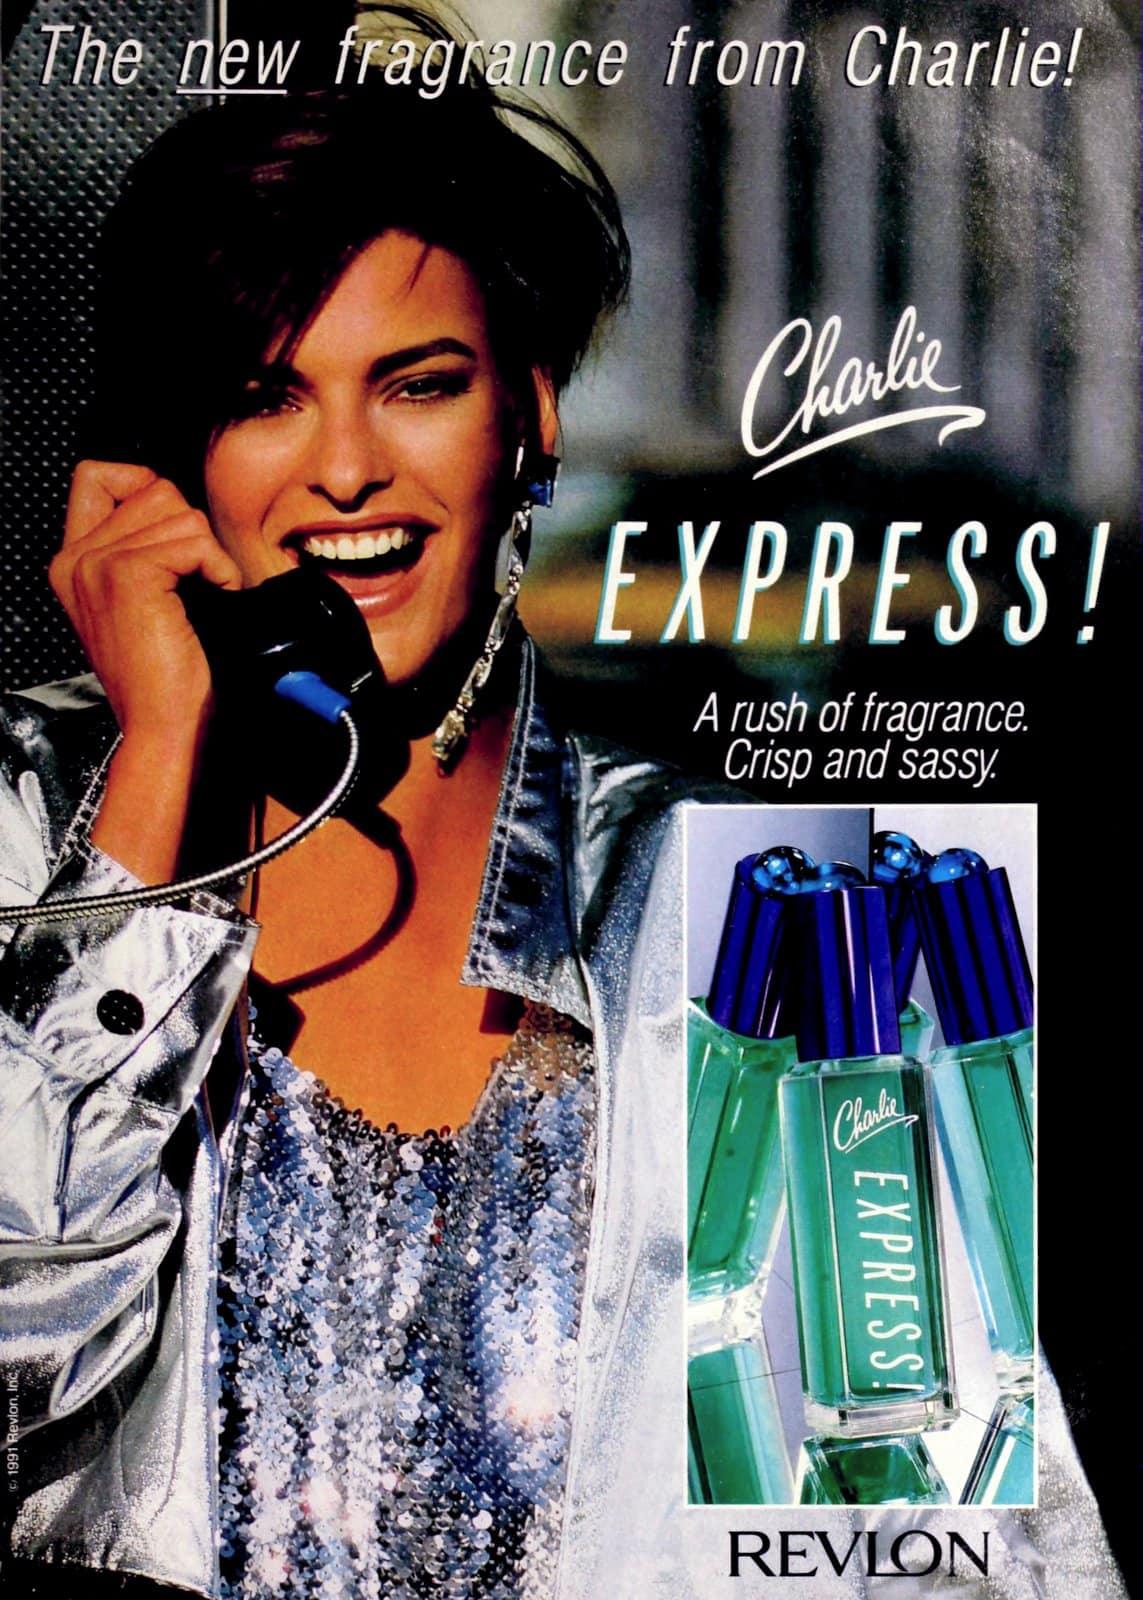 Charlie Express vintage fragrance from Revlon (1991) at ClickAmericana.com